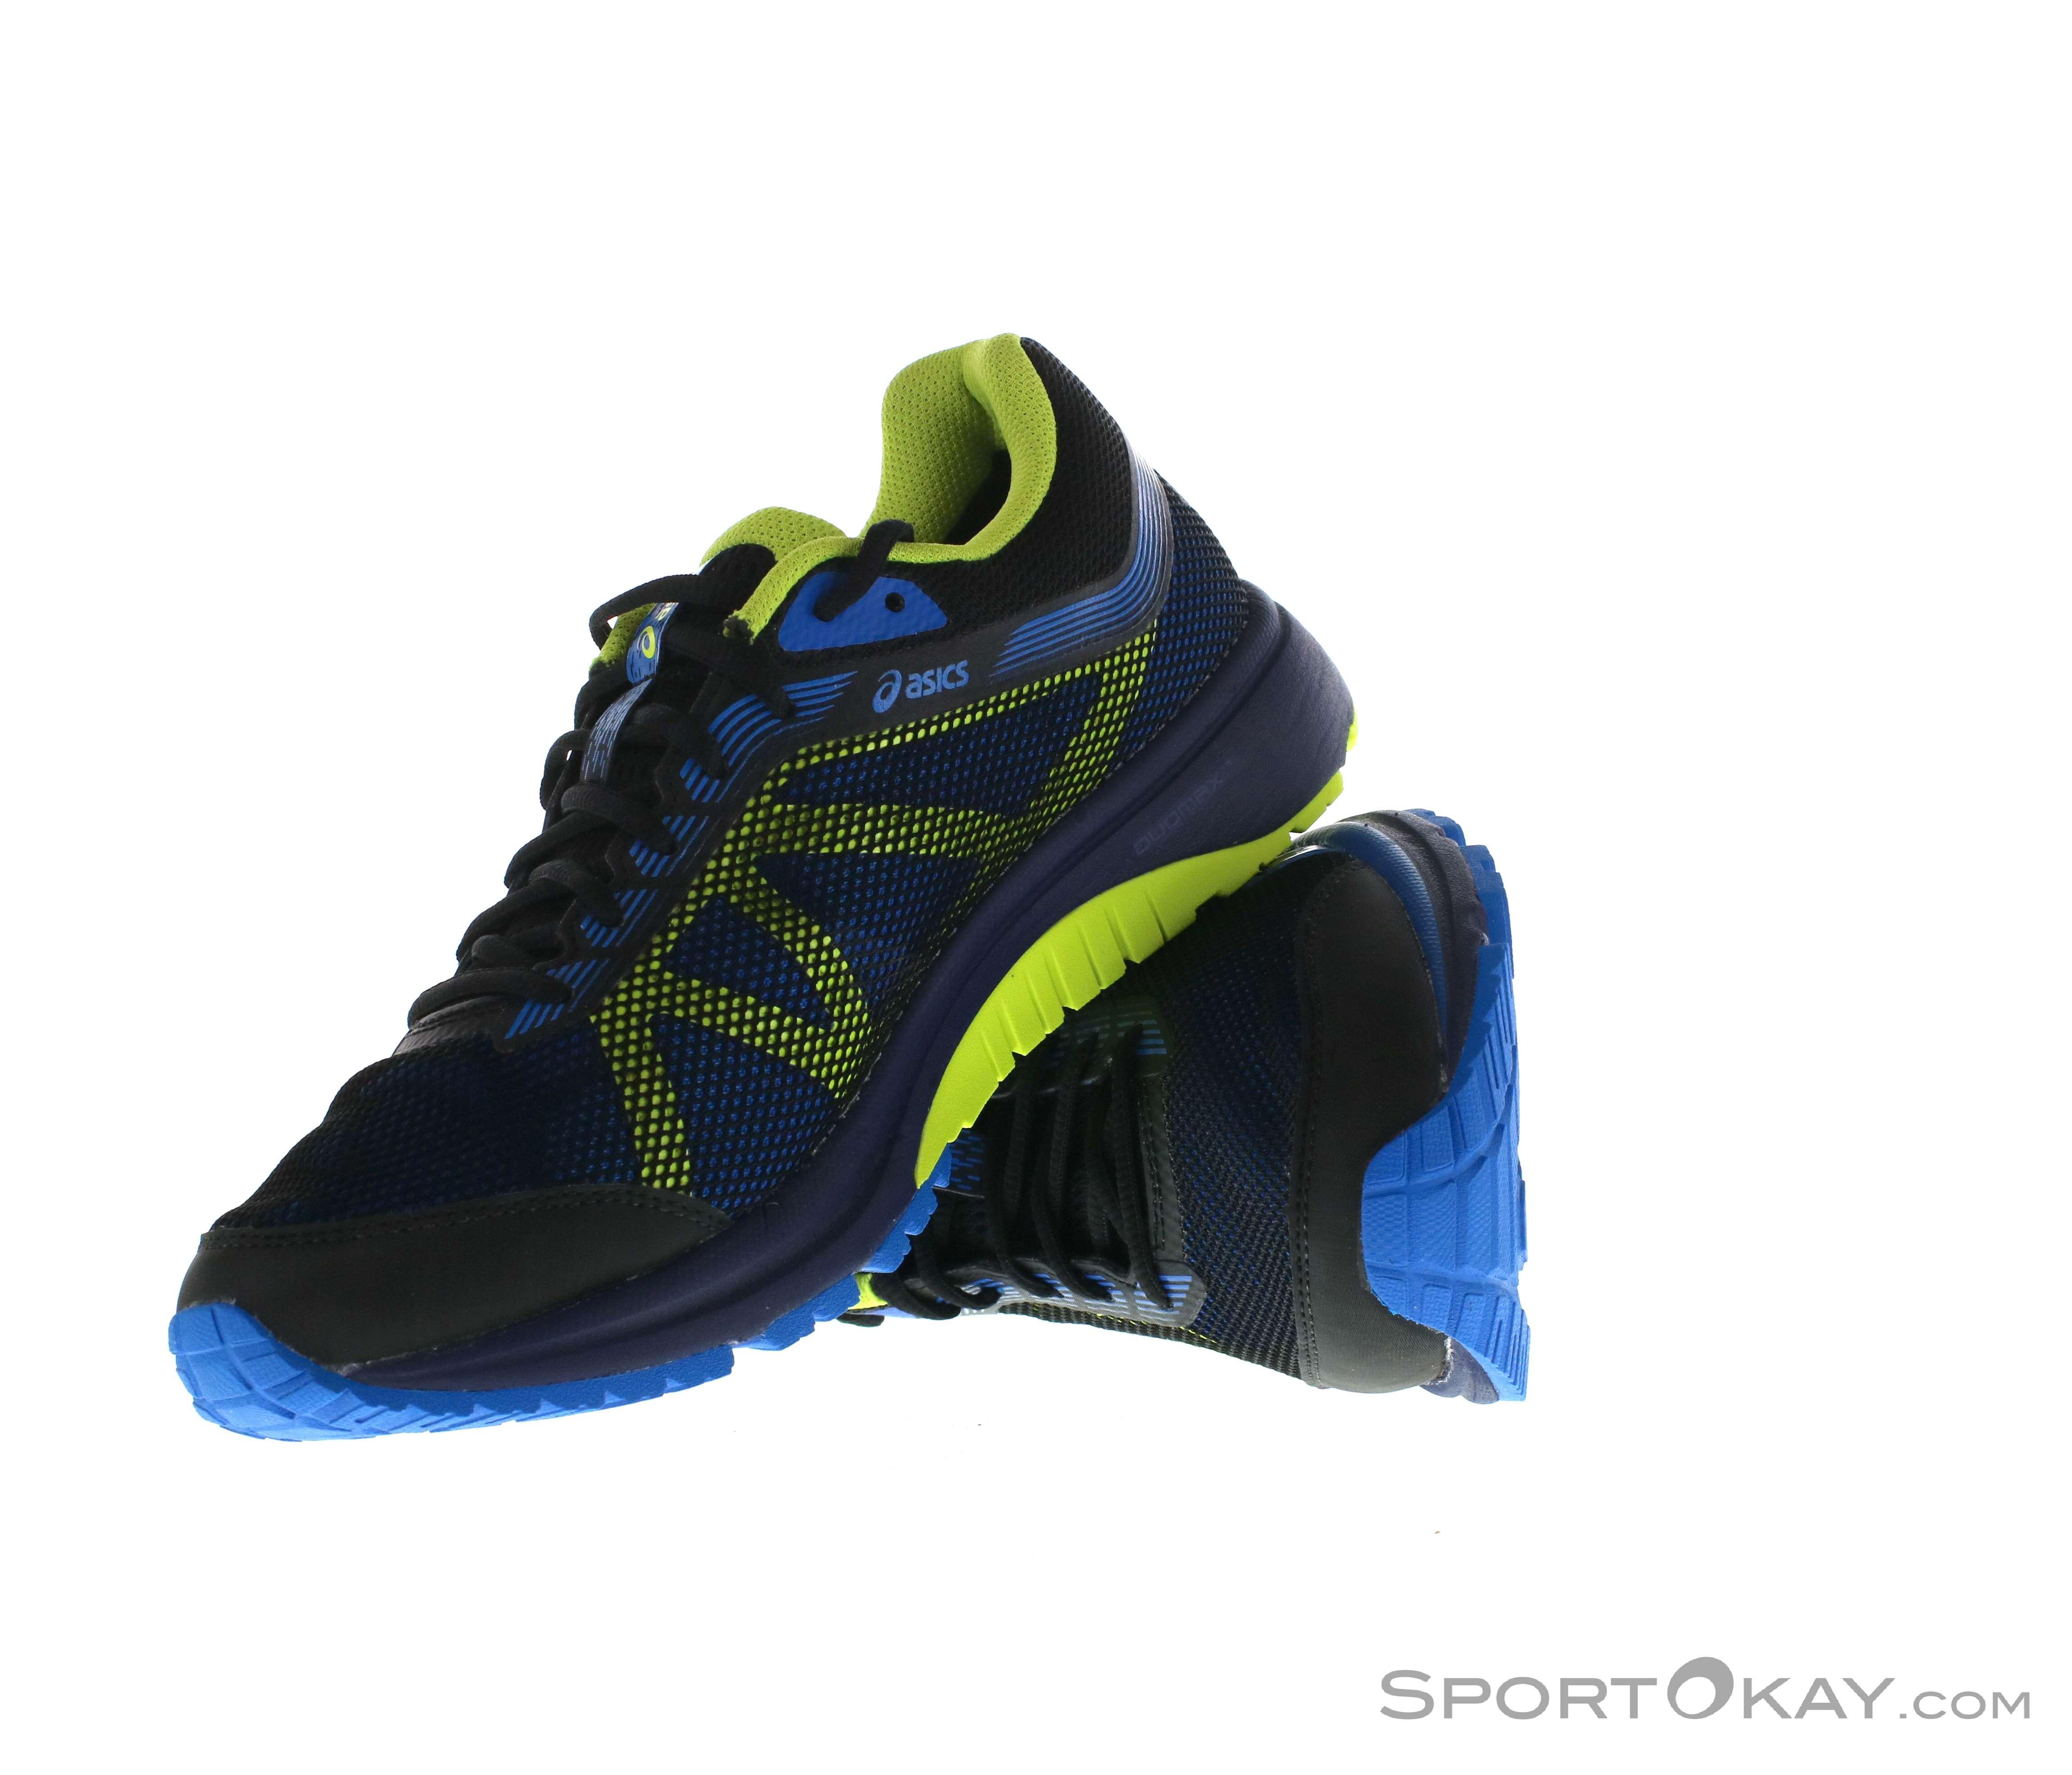 1f789cce4b5 Asics GT-1000 7 GTX Mens Running Shoes Gore-Tex - Gore-Tex Running ...